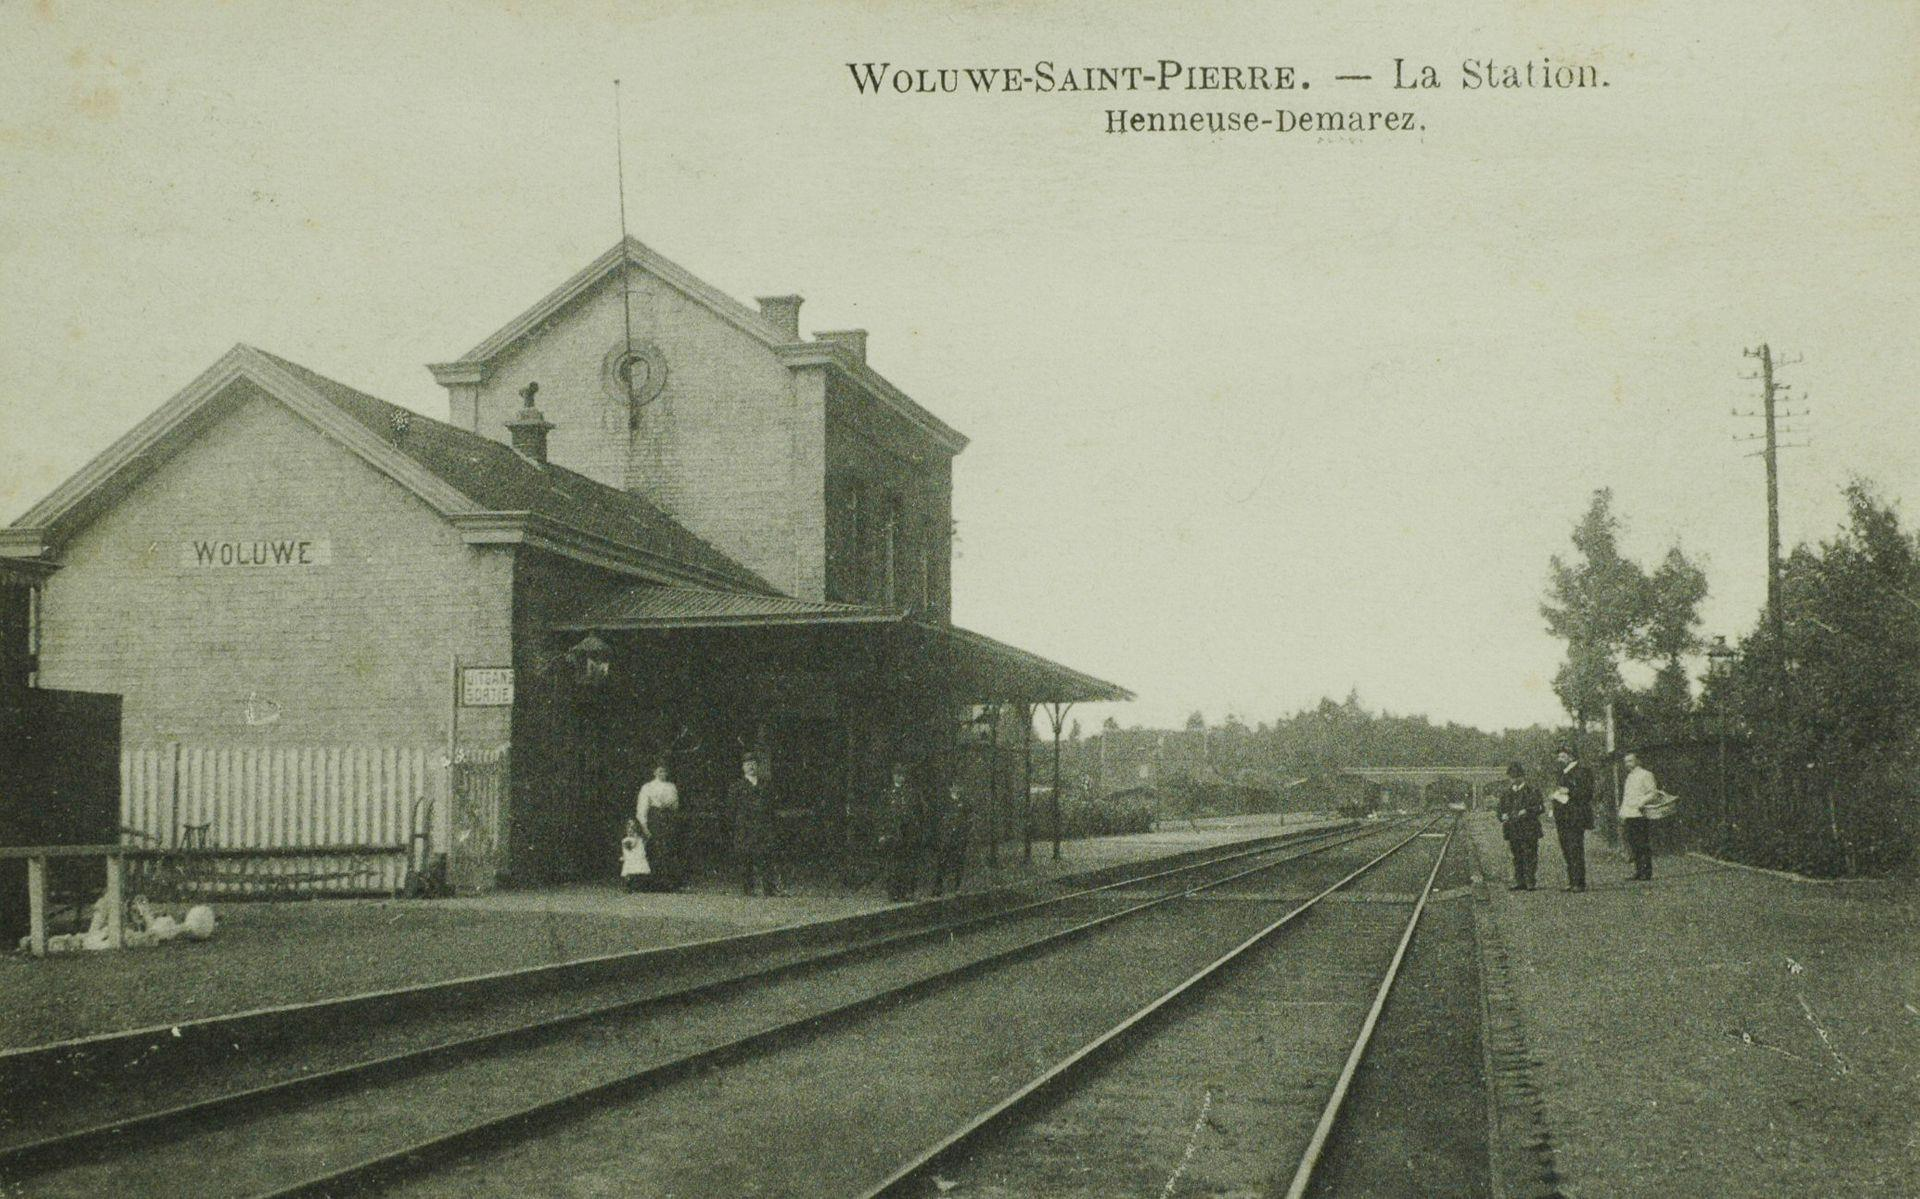 Vieux Woluwe, l'ancienne gare